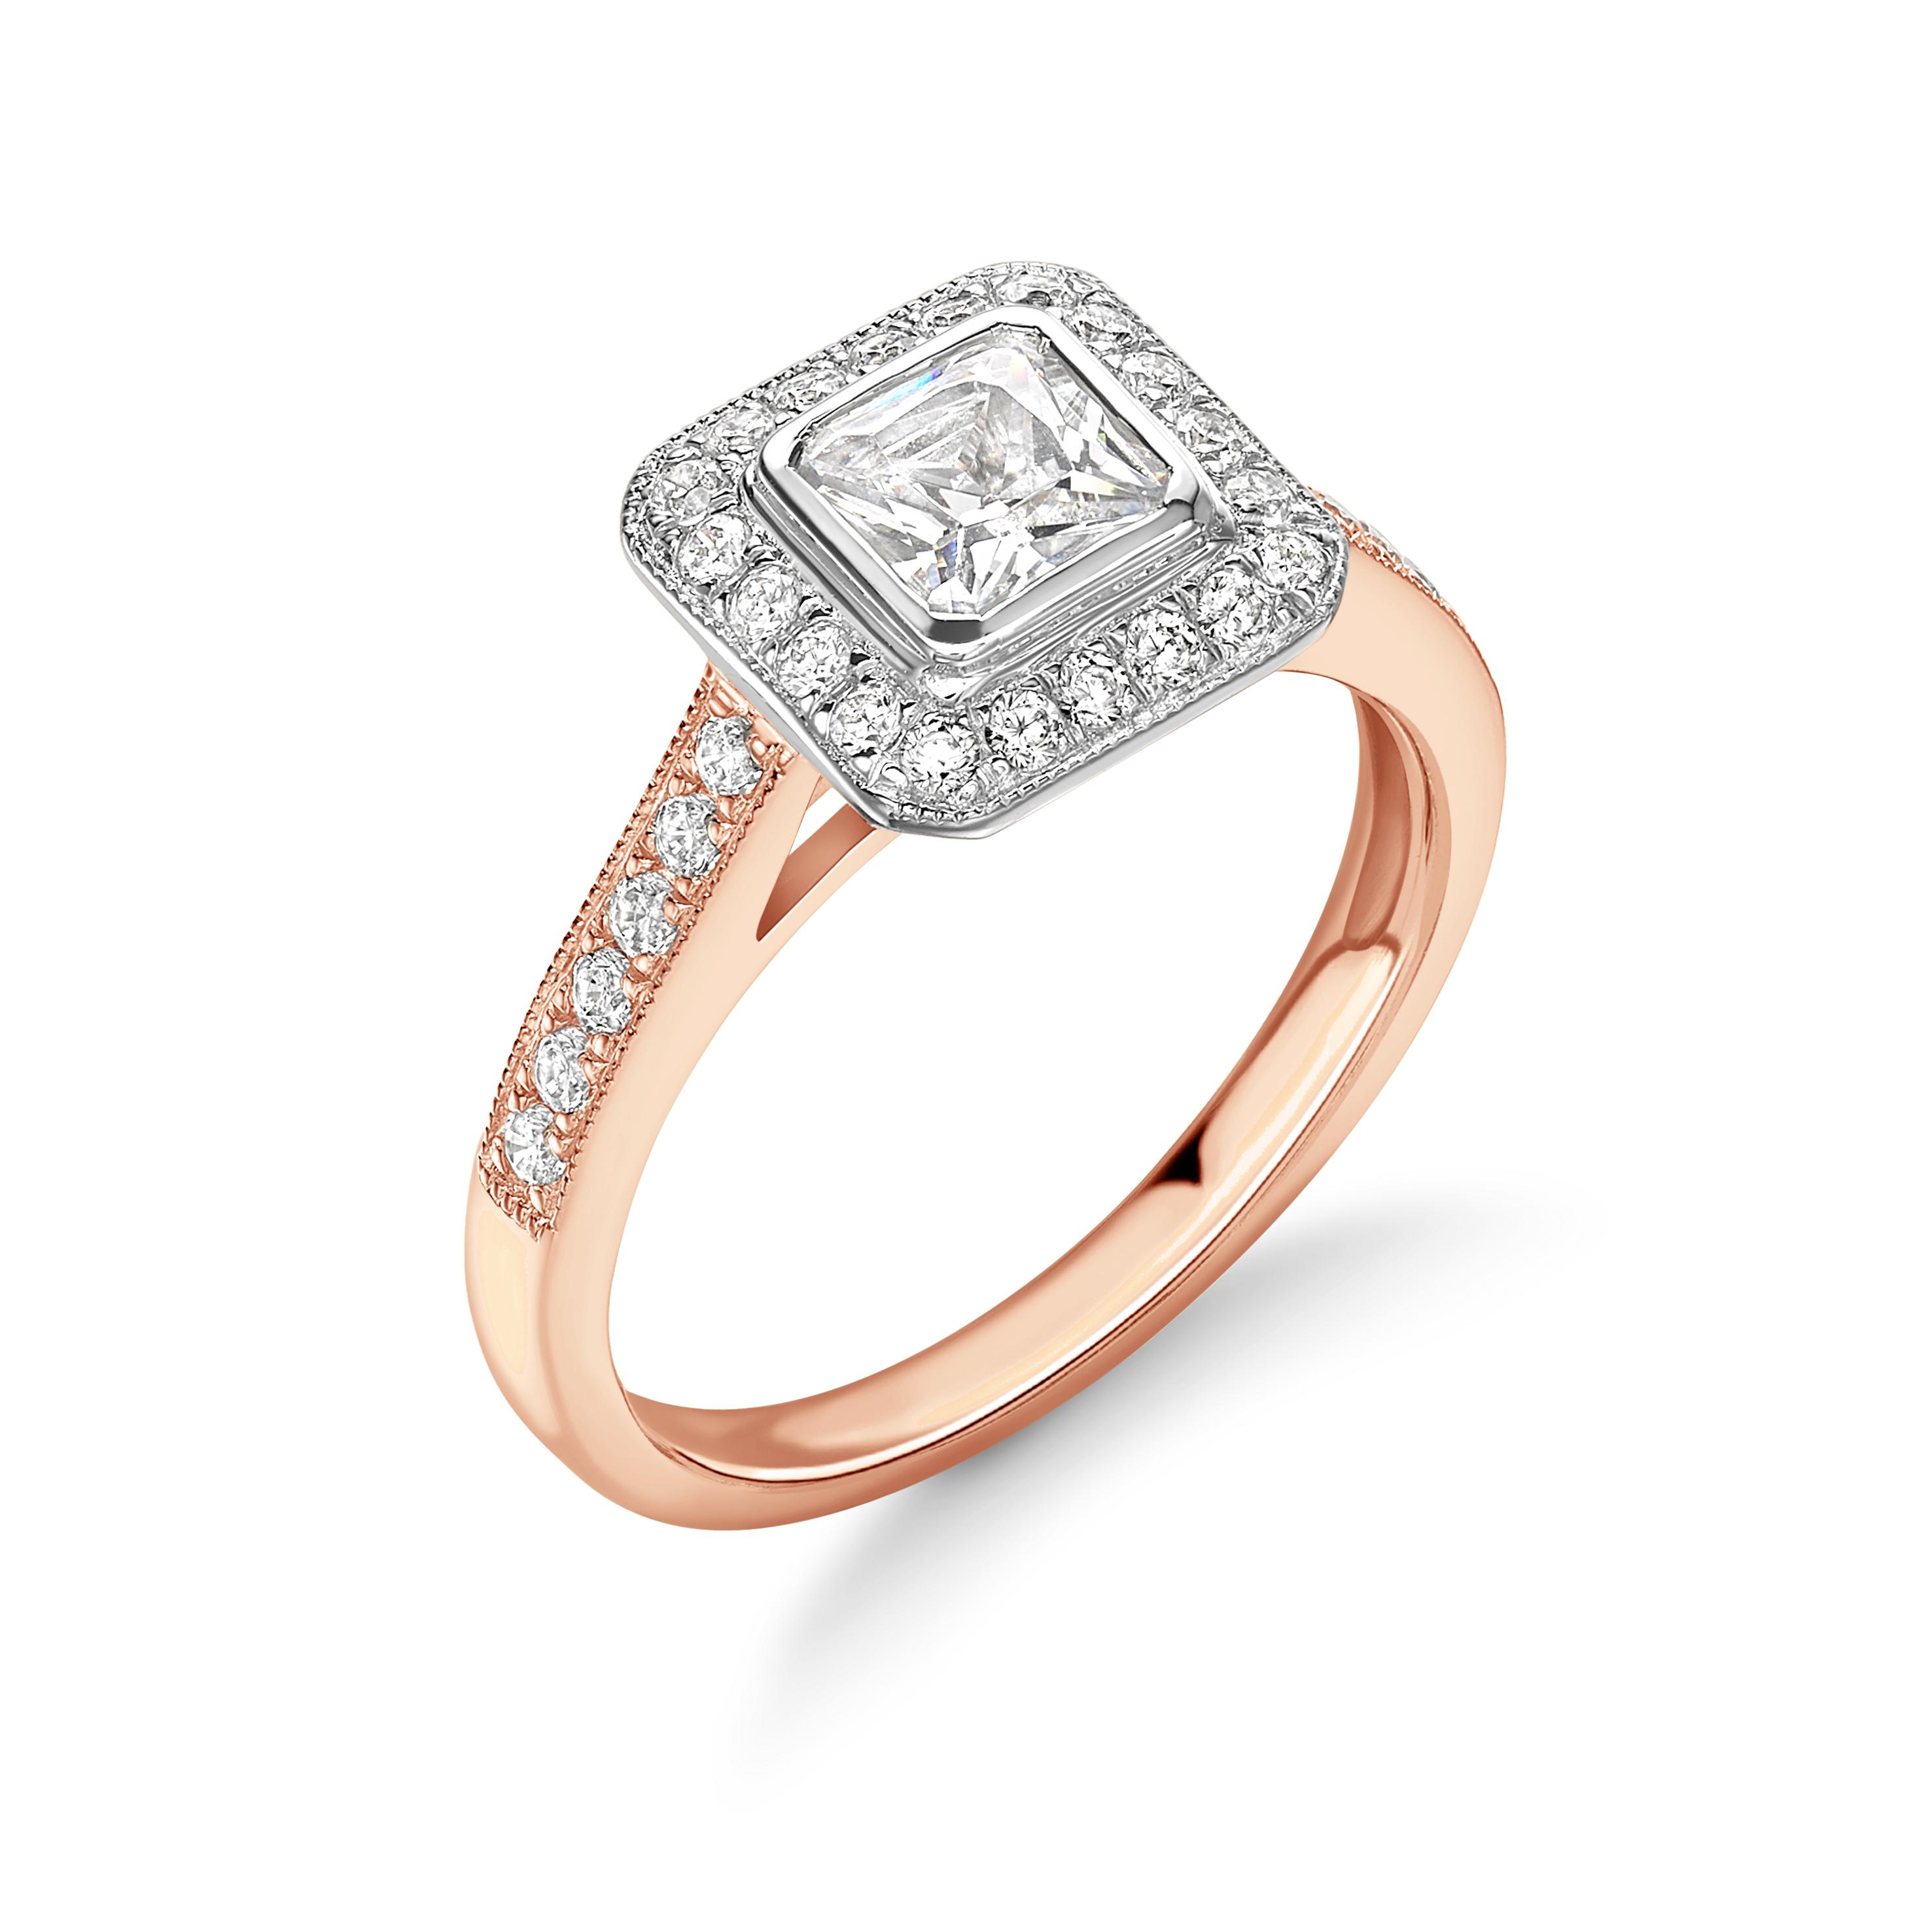 Bezel Setting Asshcer Shape Pave Setting Milligraing Halo Diamond Engagement Rings